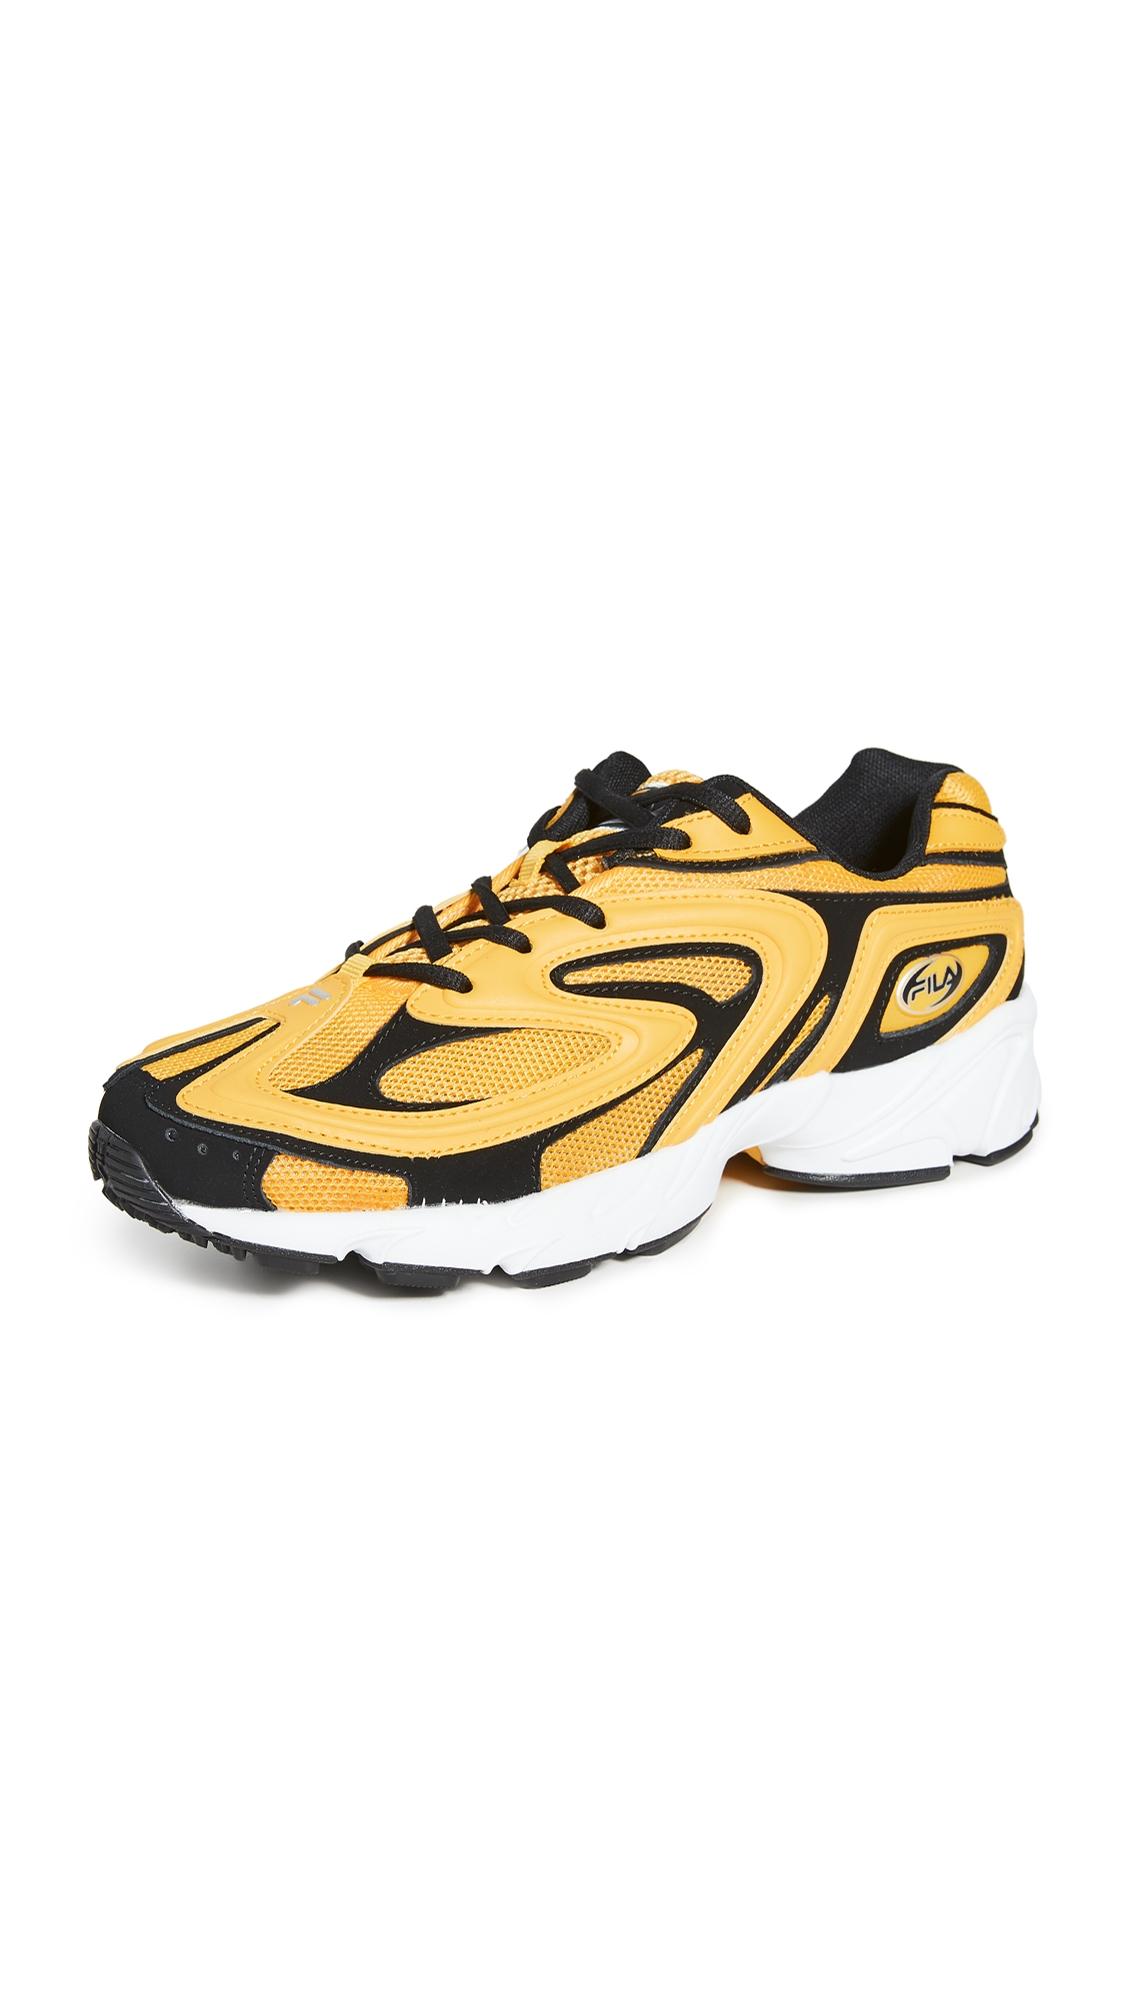 Fila Sneakers CREATOR SNEAKERS